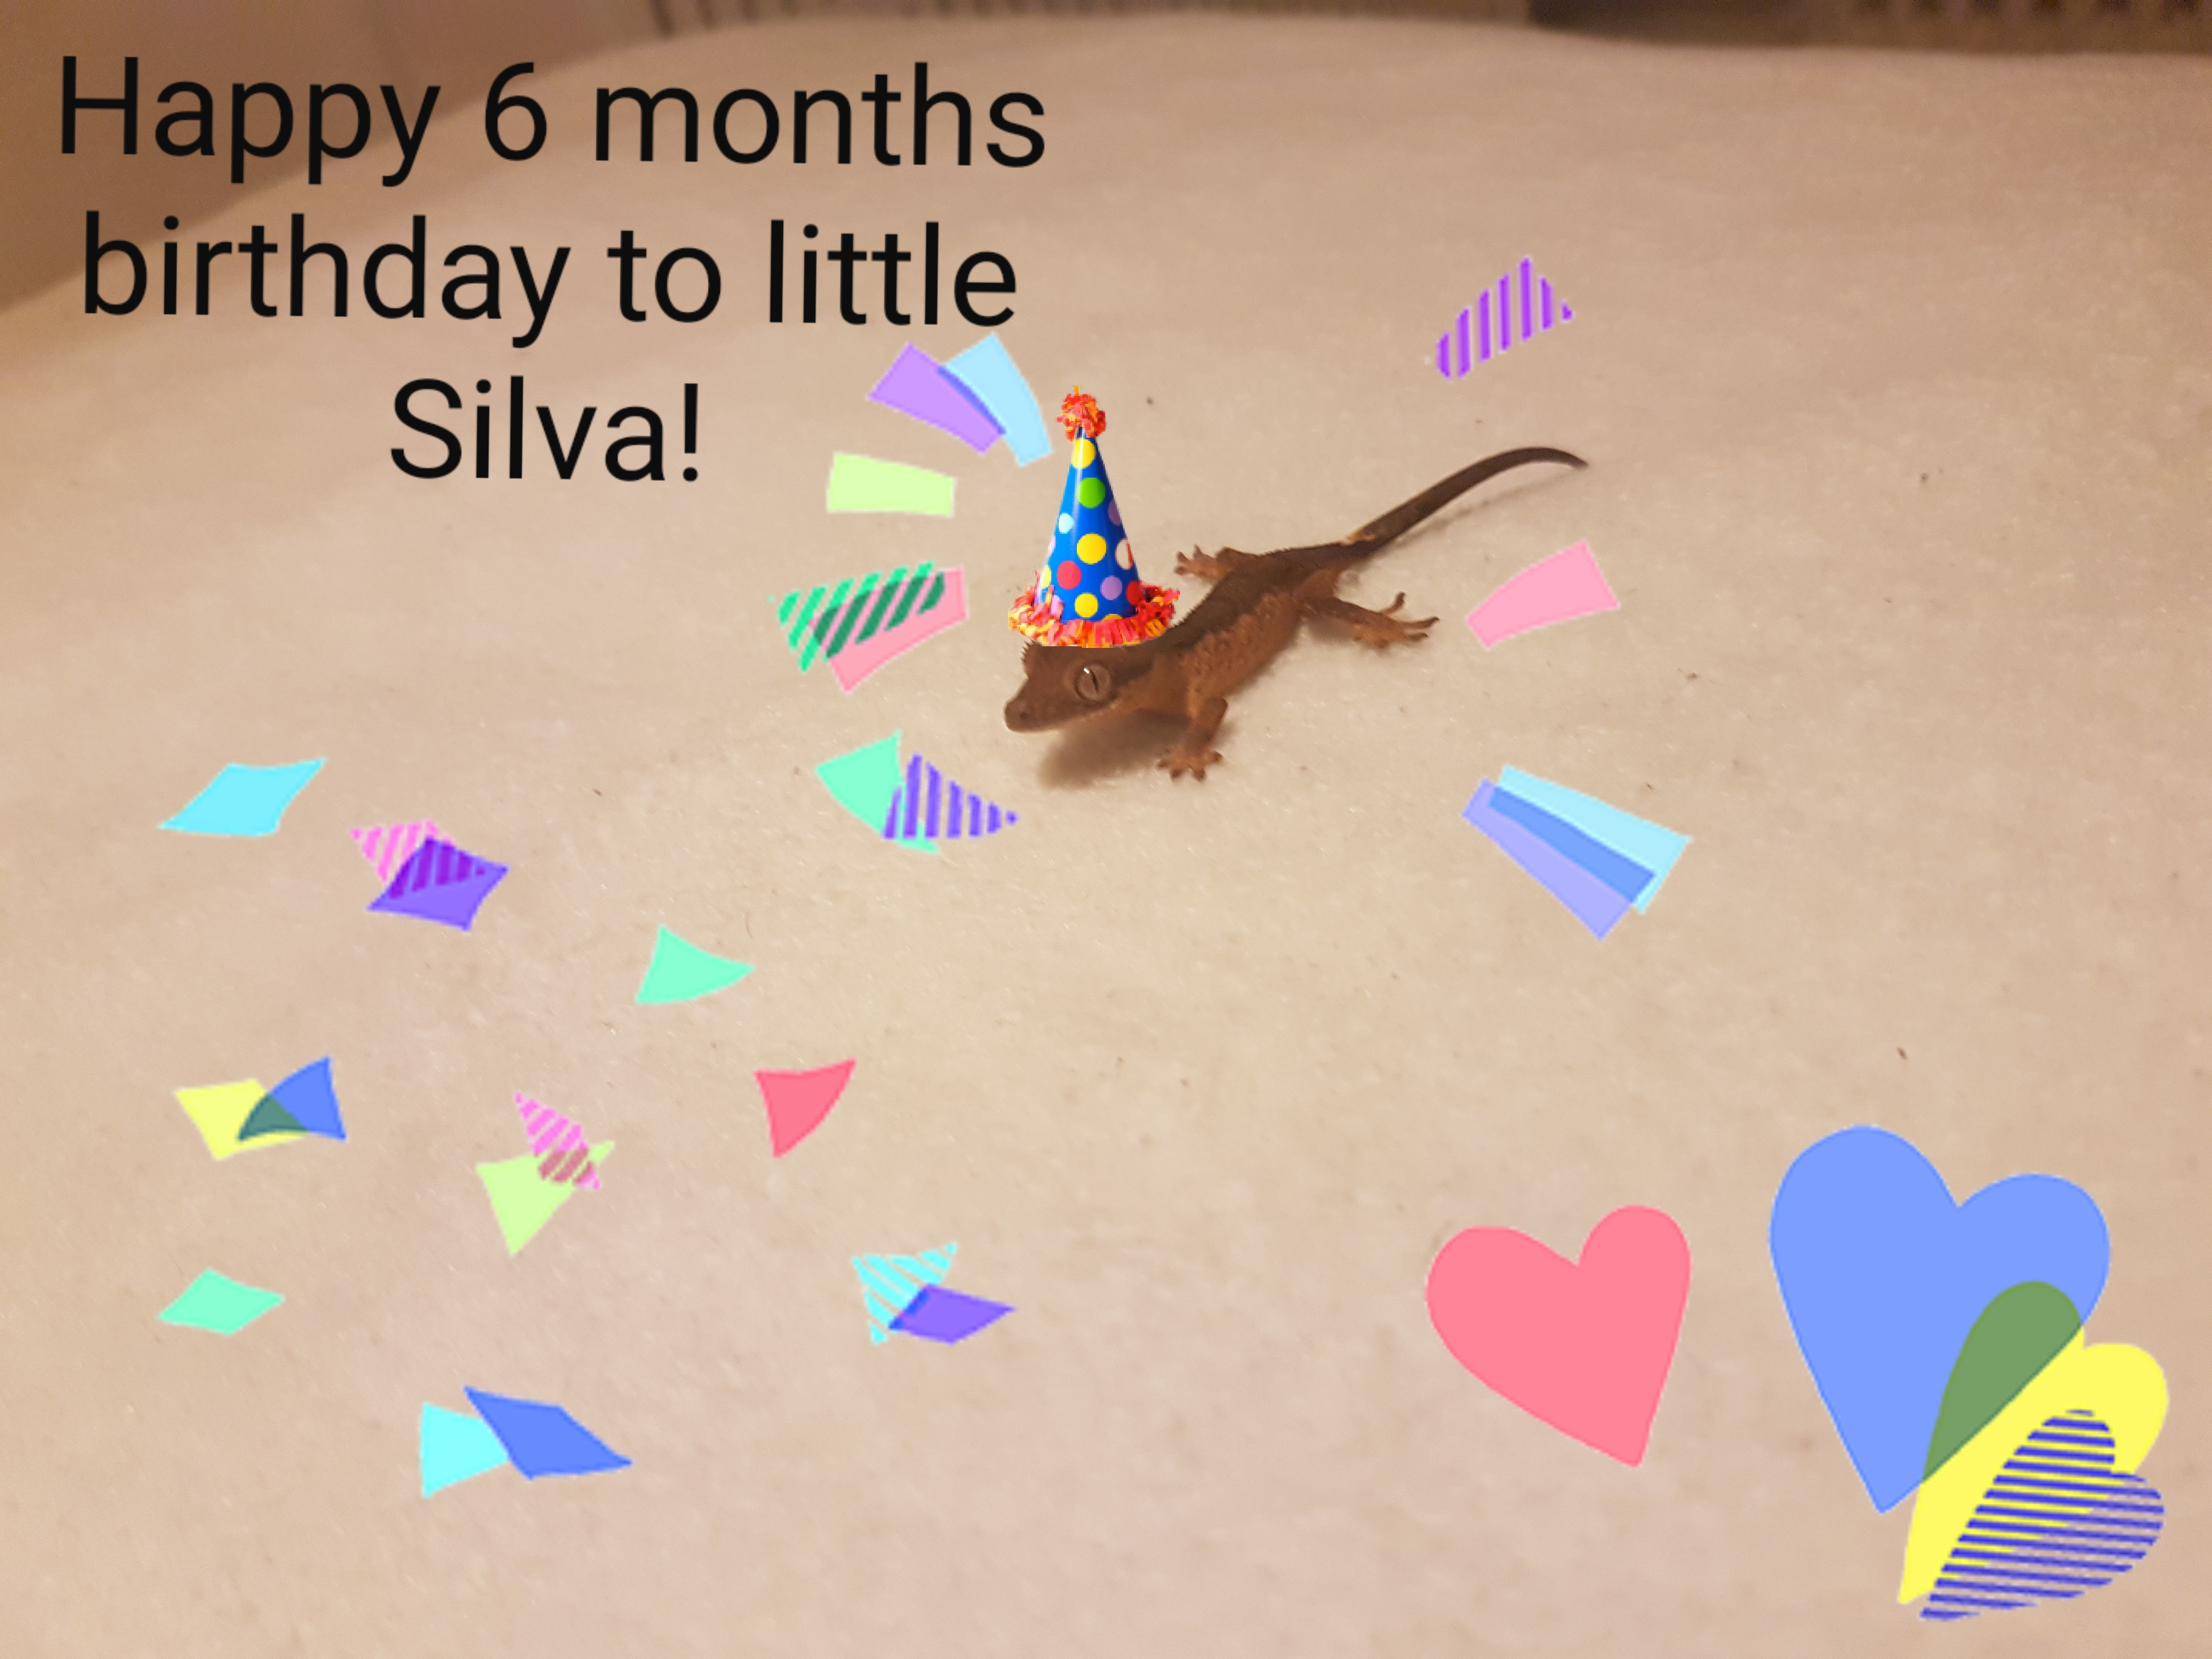 Silva 6 months birthday